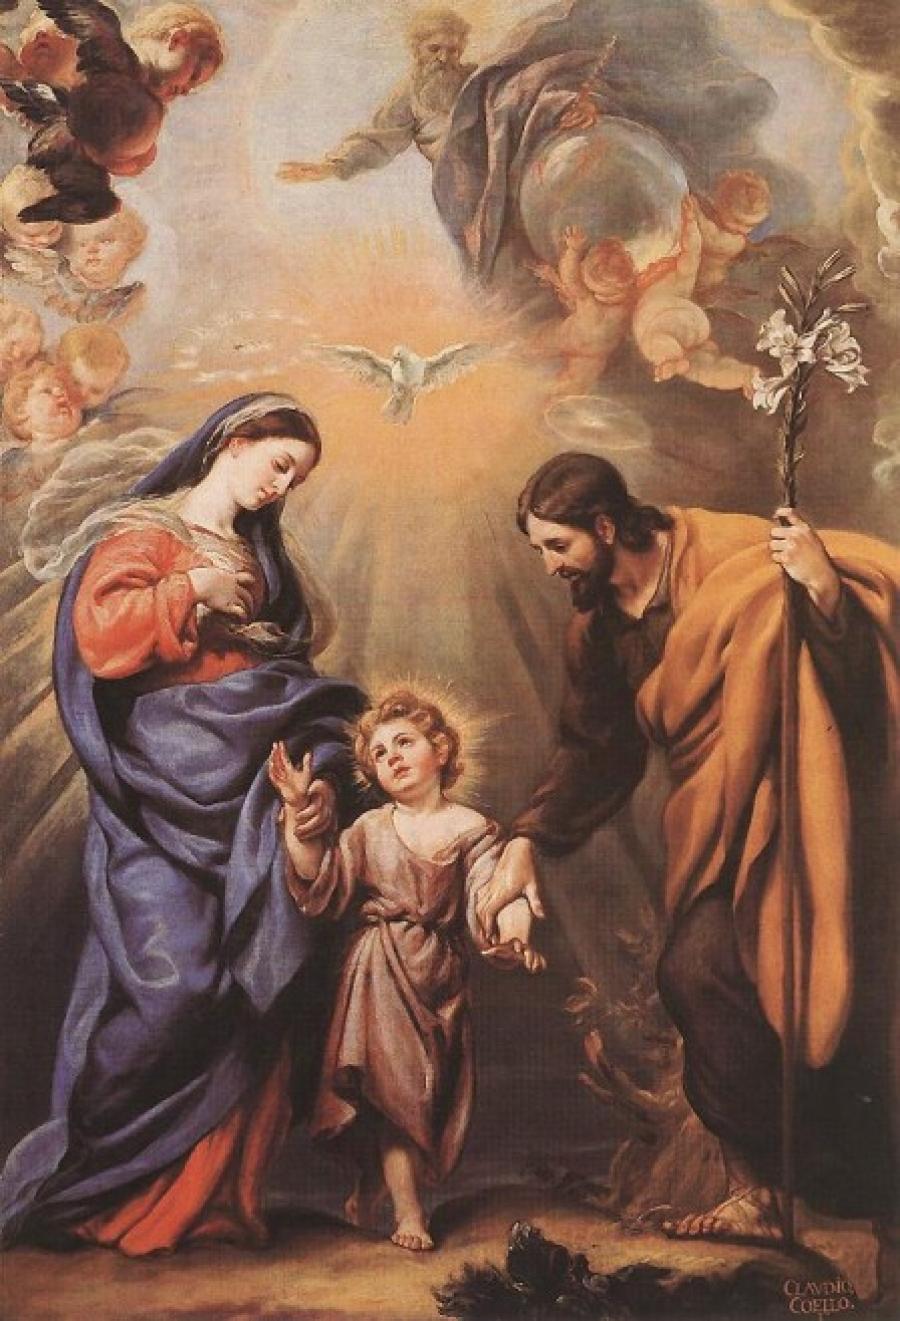 Heiliger Josef – Schutzpatron Familien